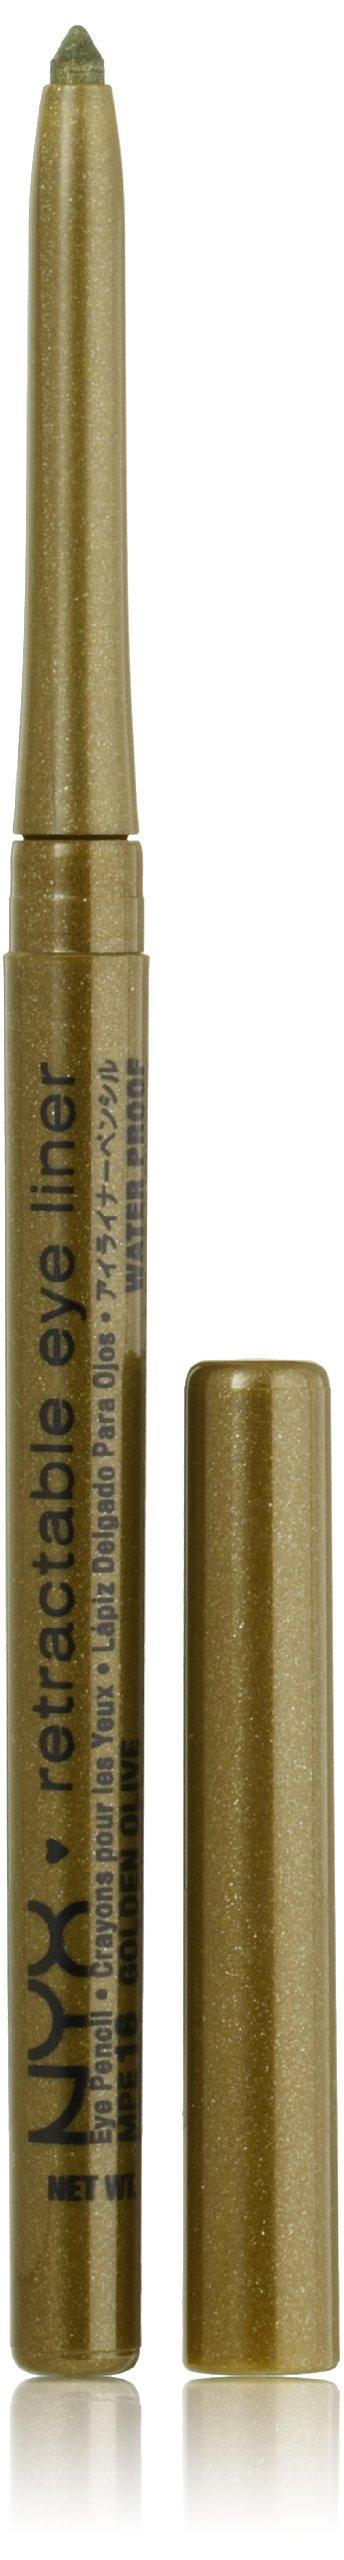 NYX Mechanical Eye Pencil, Golden Olive